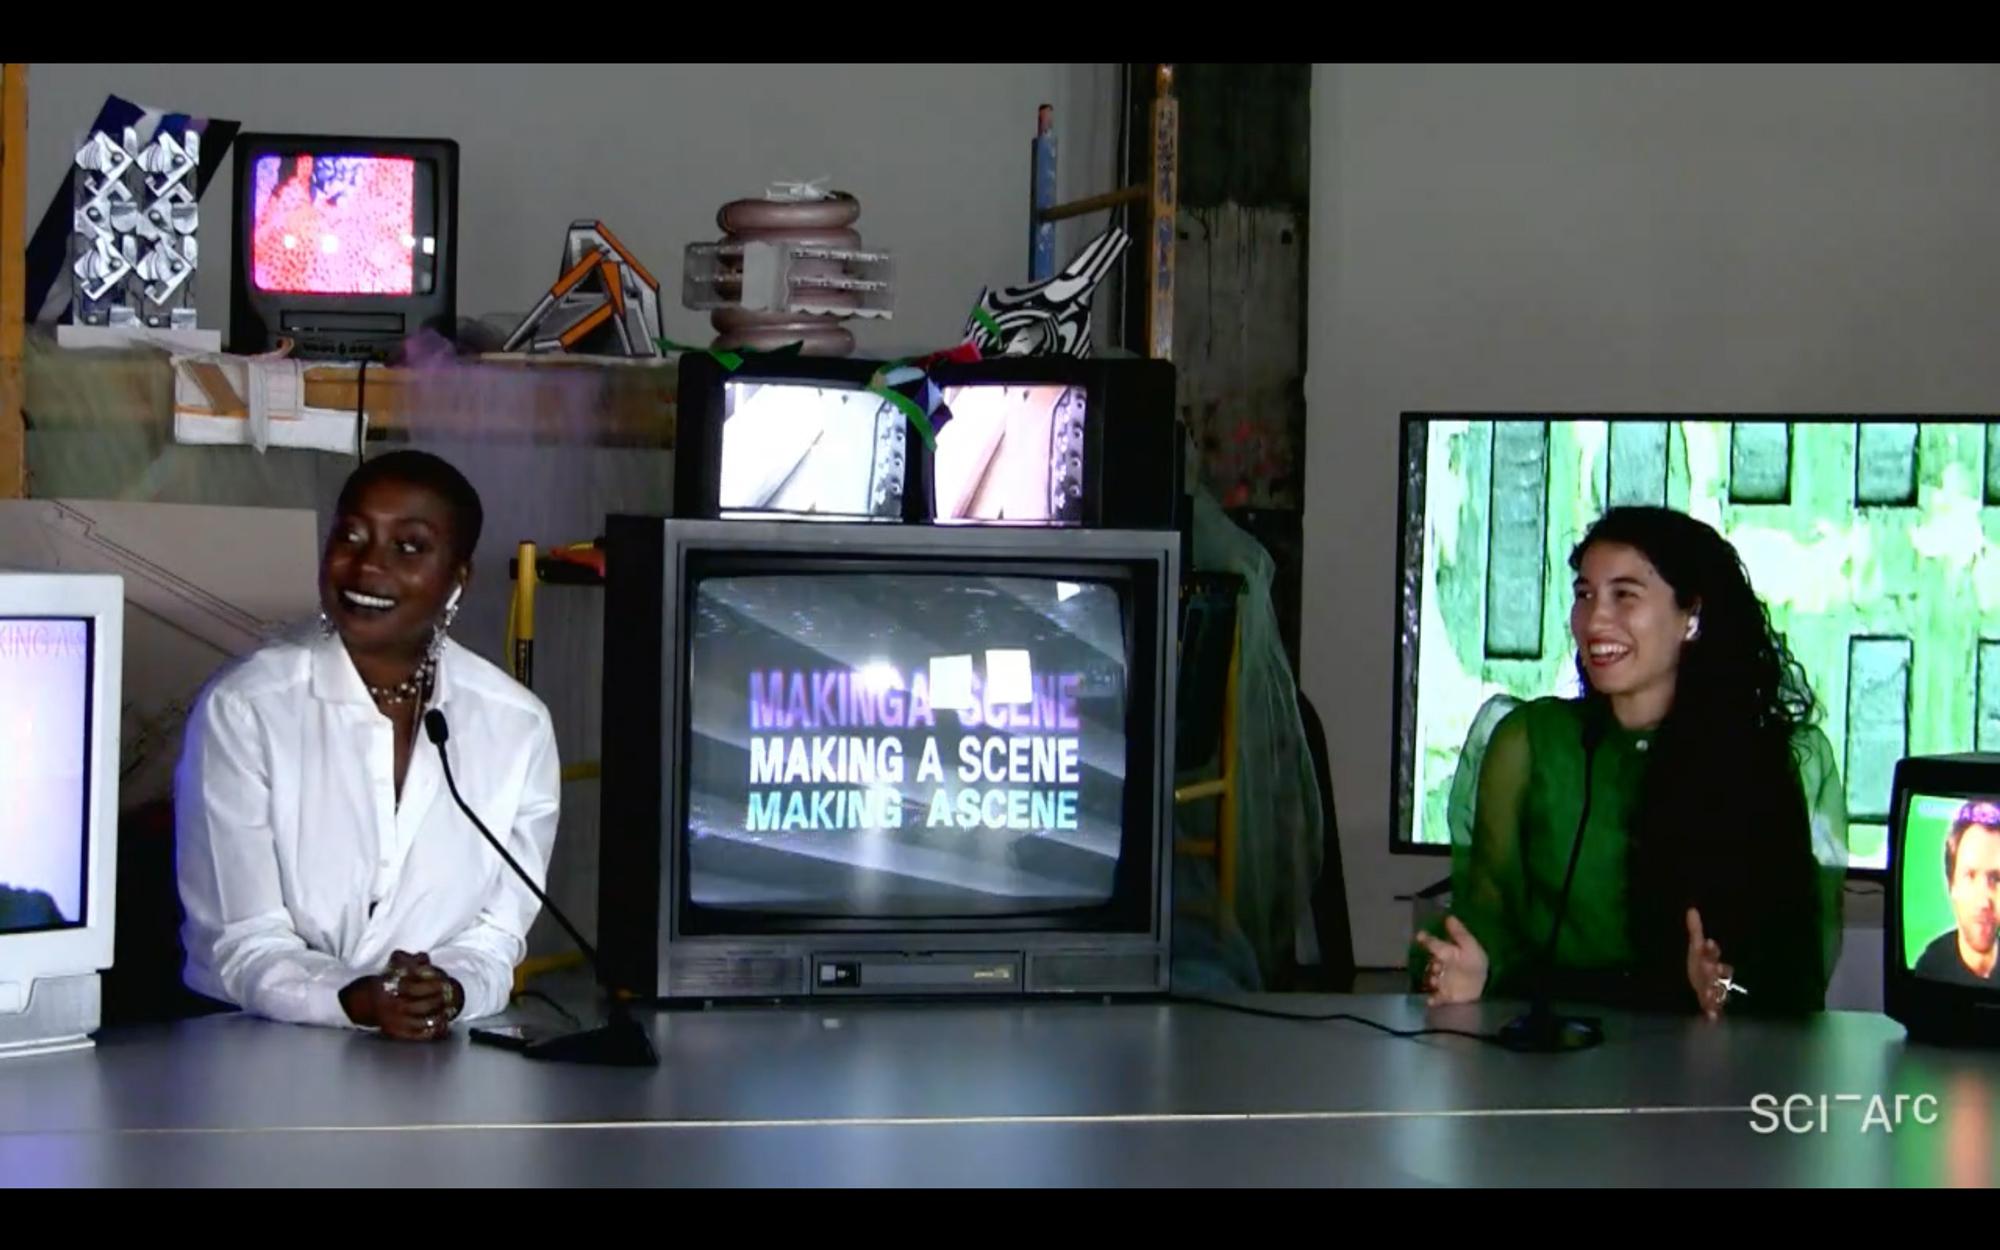 women smiling sitting between tv screens